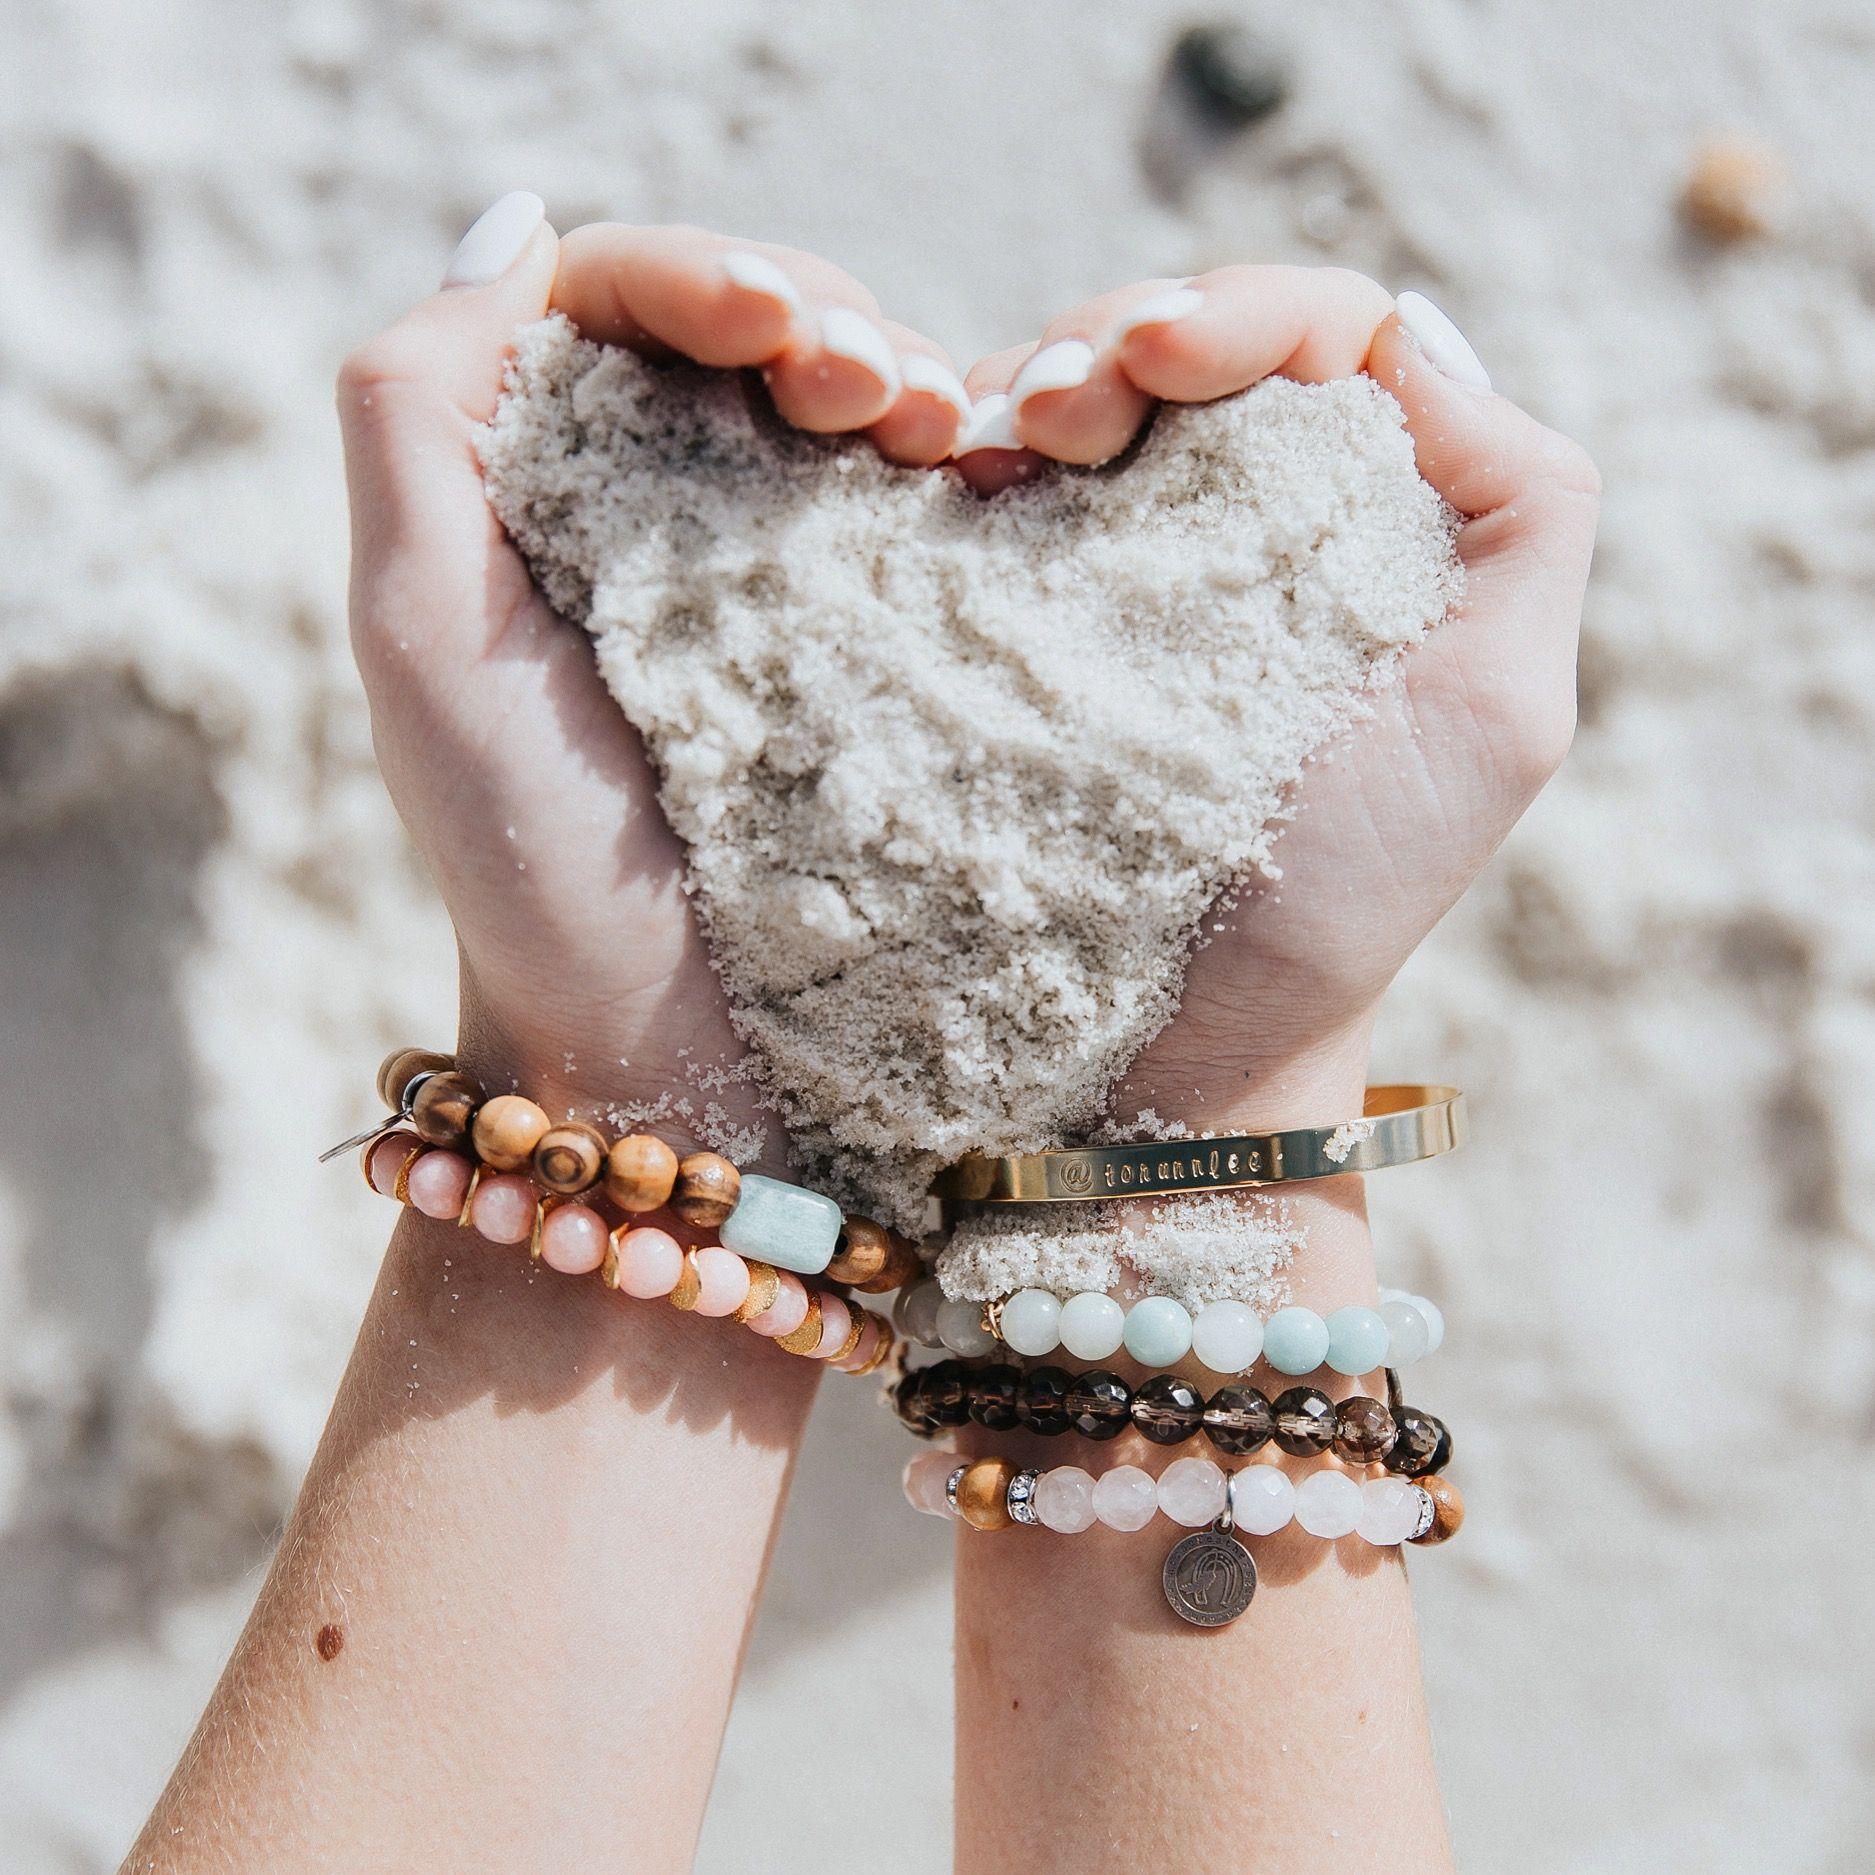 beach pictures. beach bracelets. beach love. #beach #sand #beadedbracelets cool beach pics, cool sand pictures